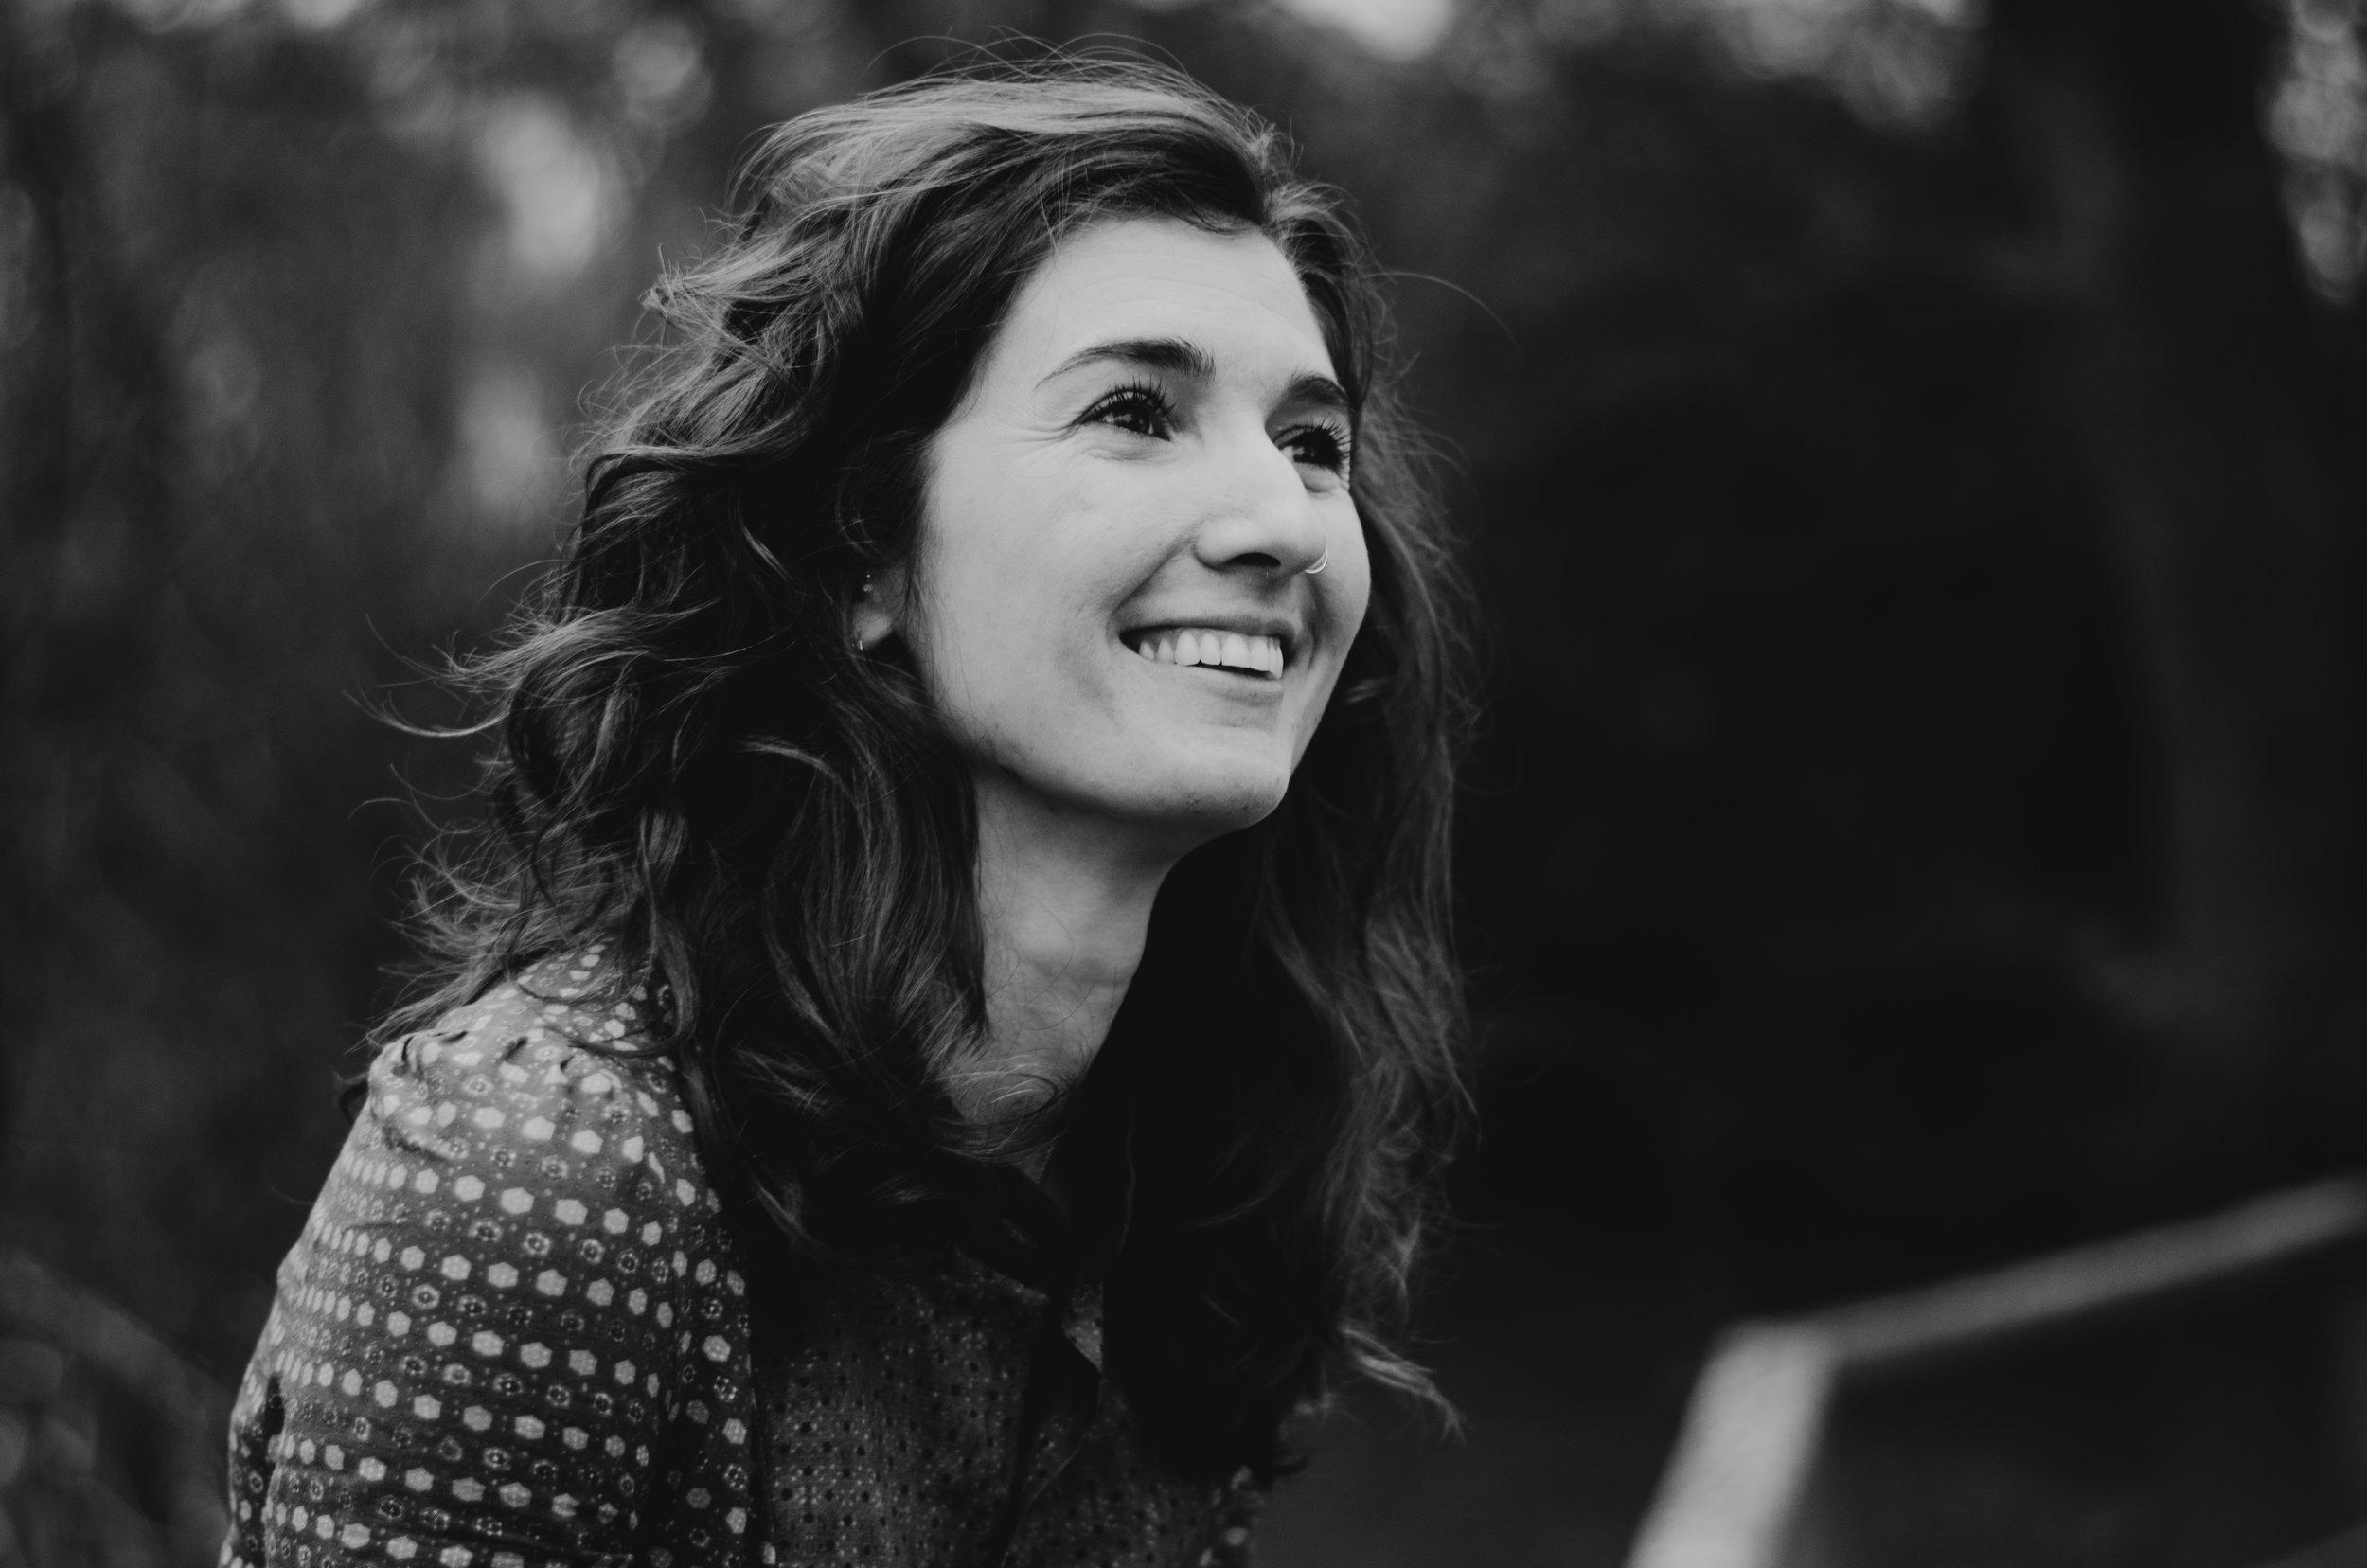 Chloe - Portraits - Aiste Saulyte Photography - 2018-01-05-49.jpg